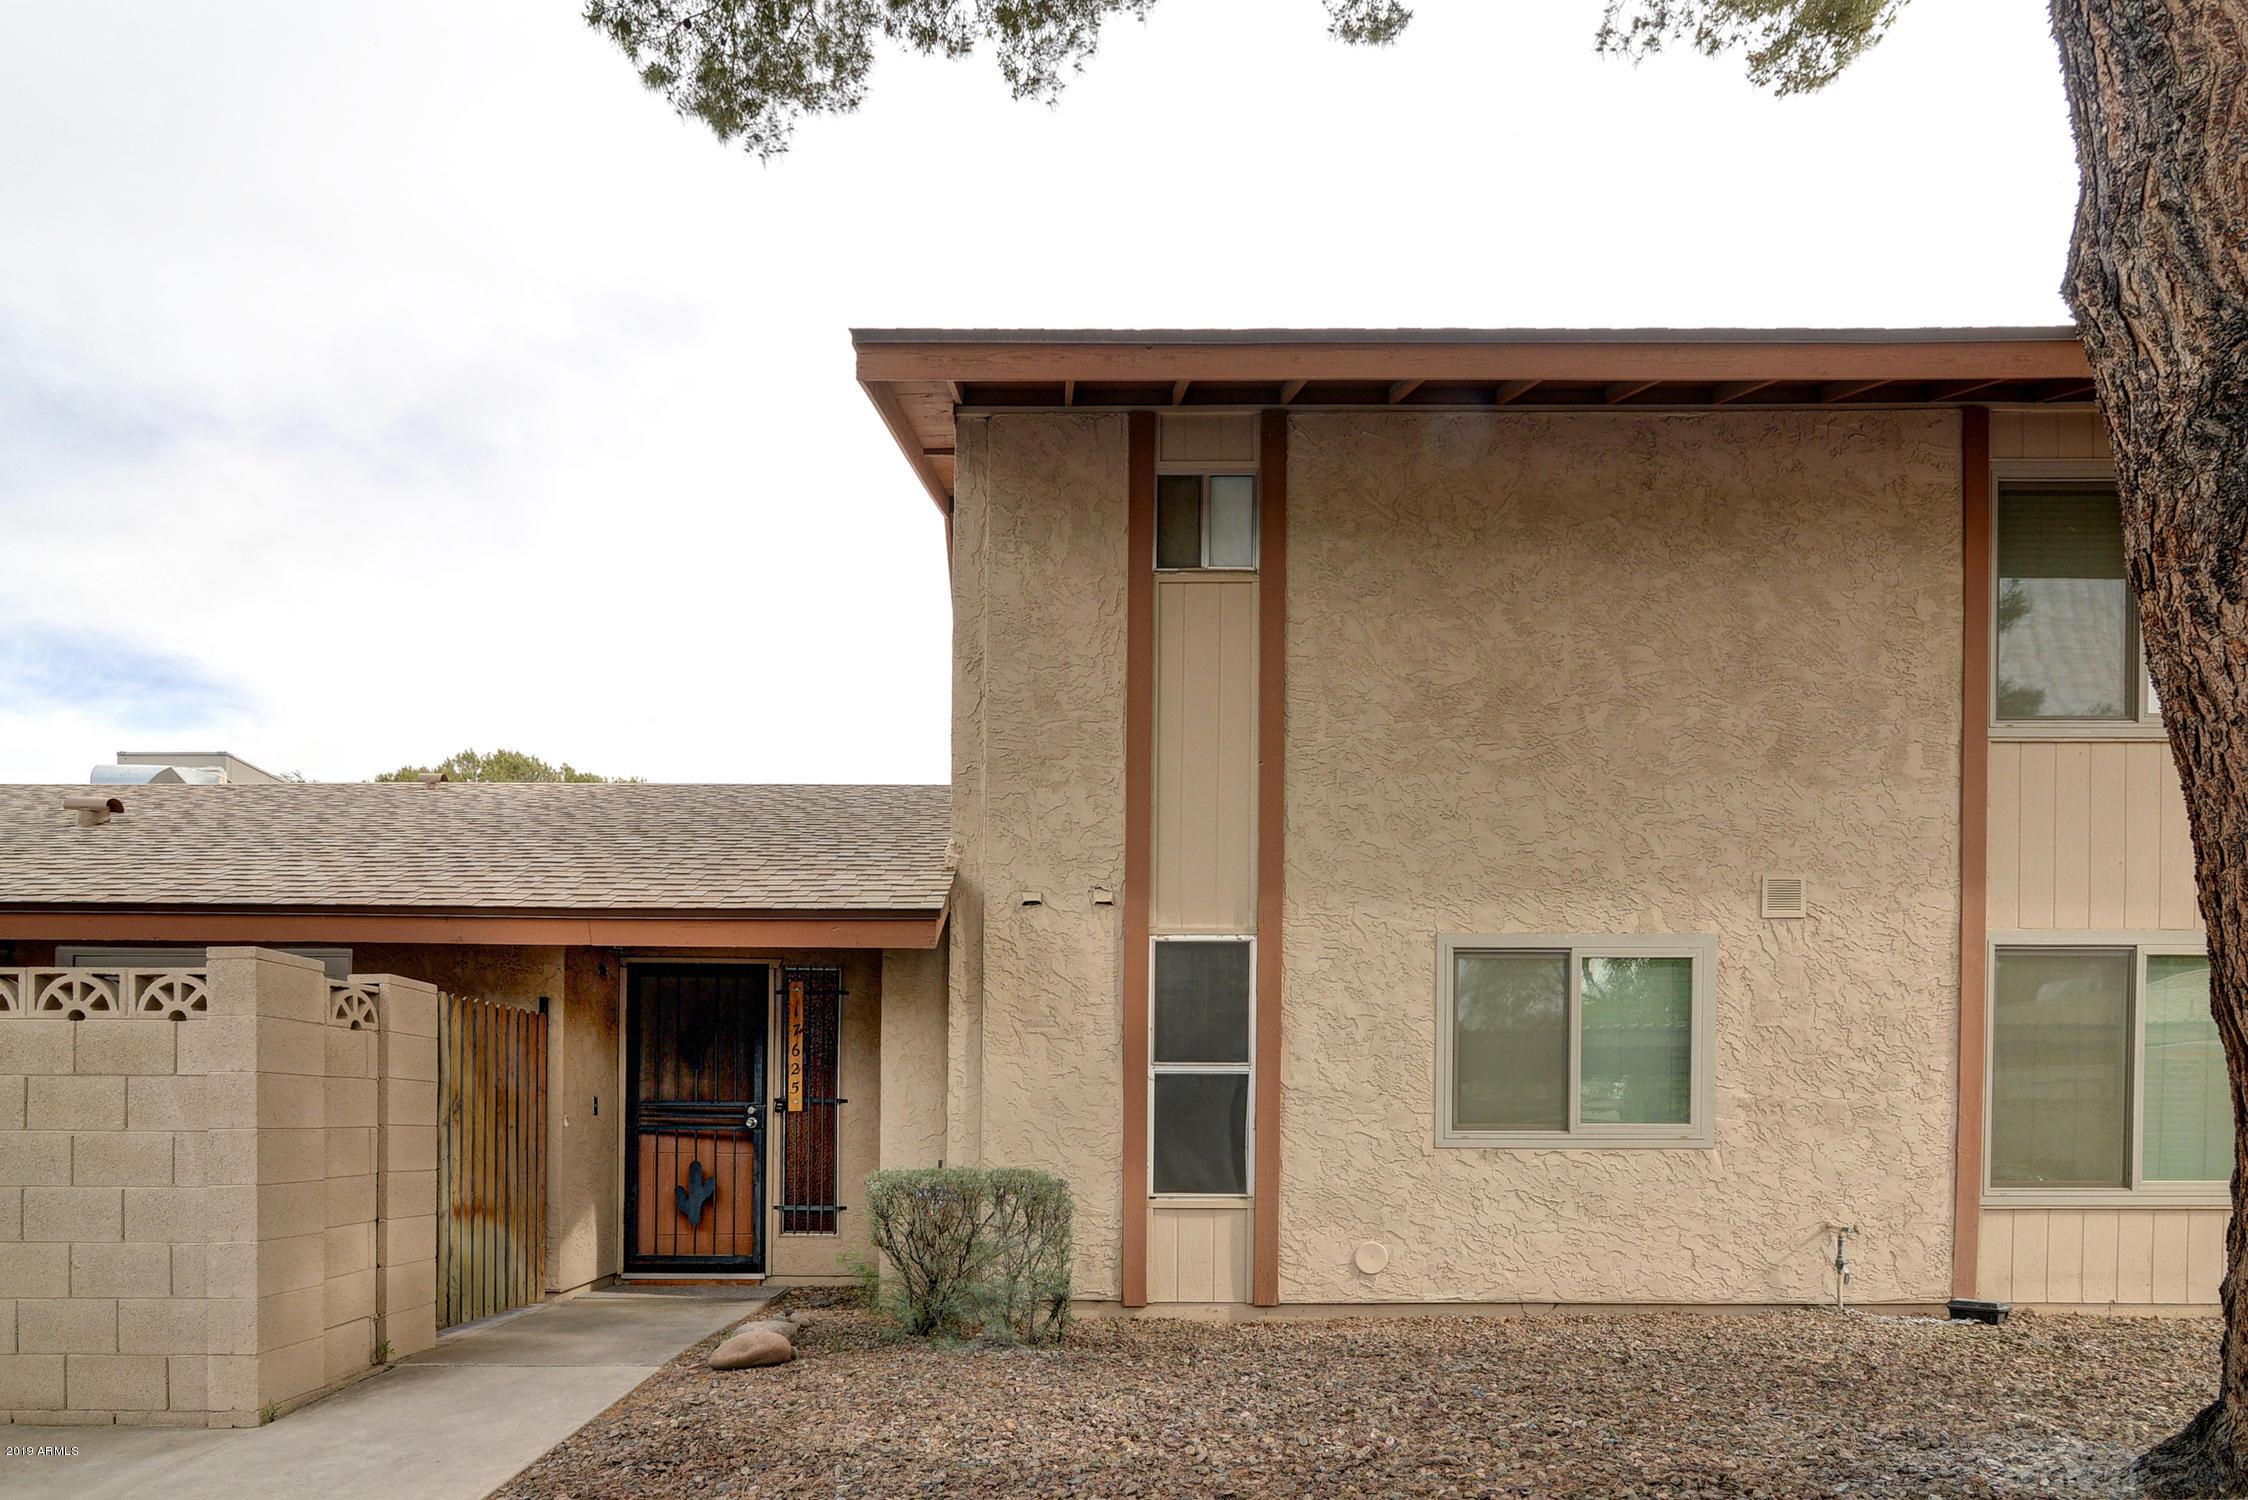 Photo of 17625 N 45TH Avenue, Glendale, AZ 85308